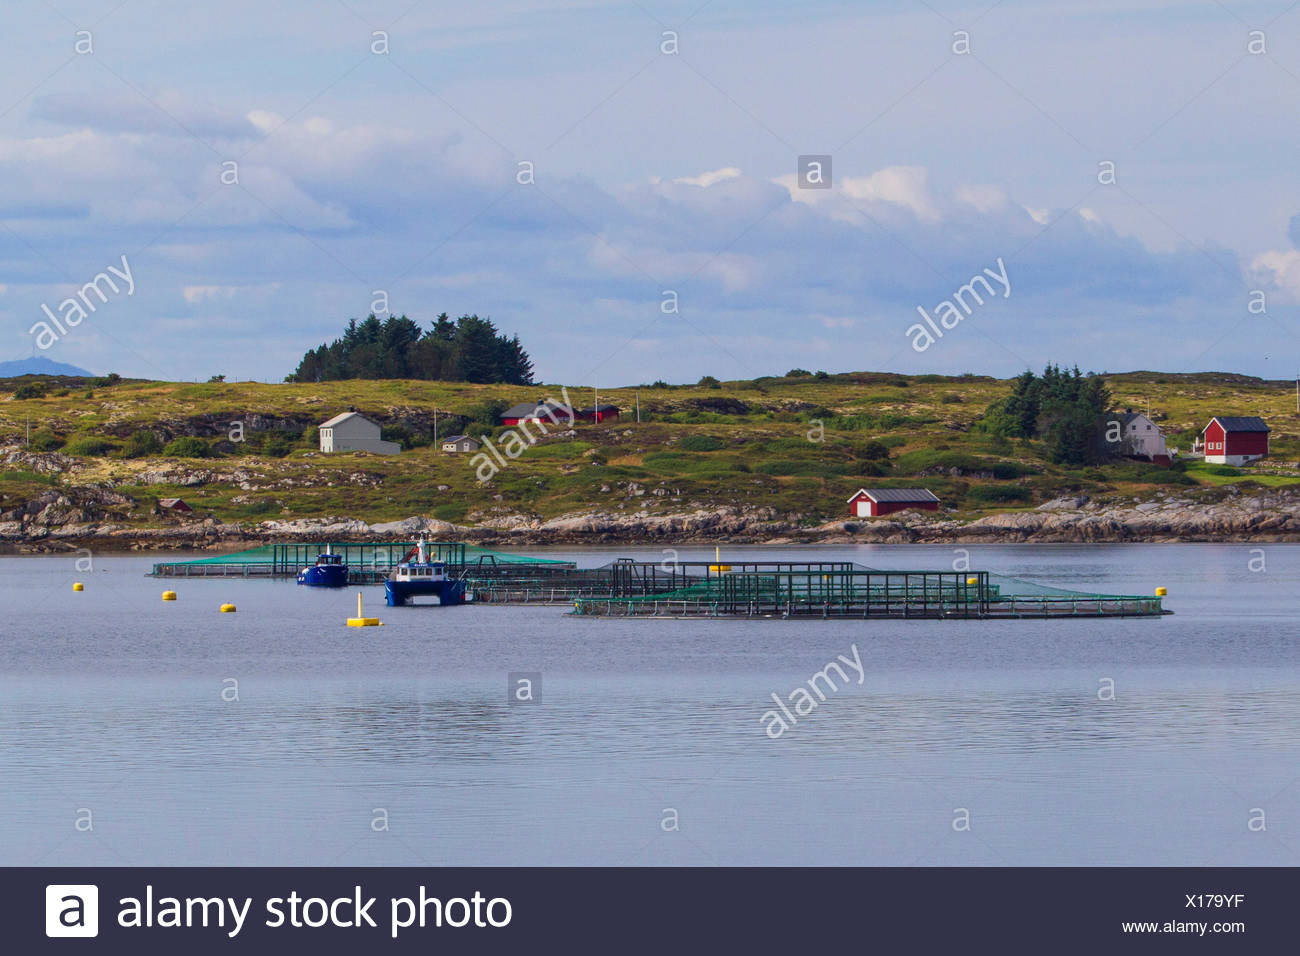 Atlantic salmon, ouananiche, lake Atlantic salmon, landlocked salmon, Sebago salmon (Salmo salar), salmonid farm in a fjord, Norway, Hitra - Stock Image